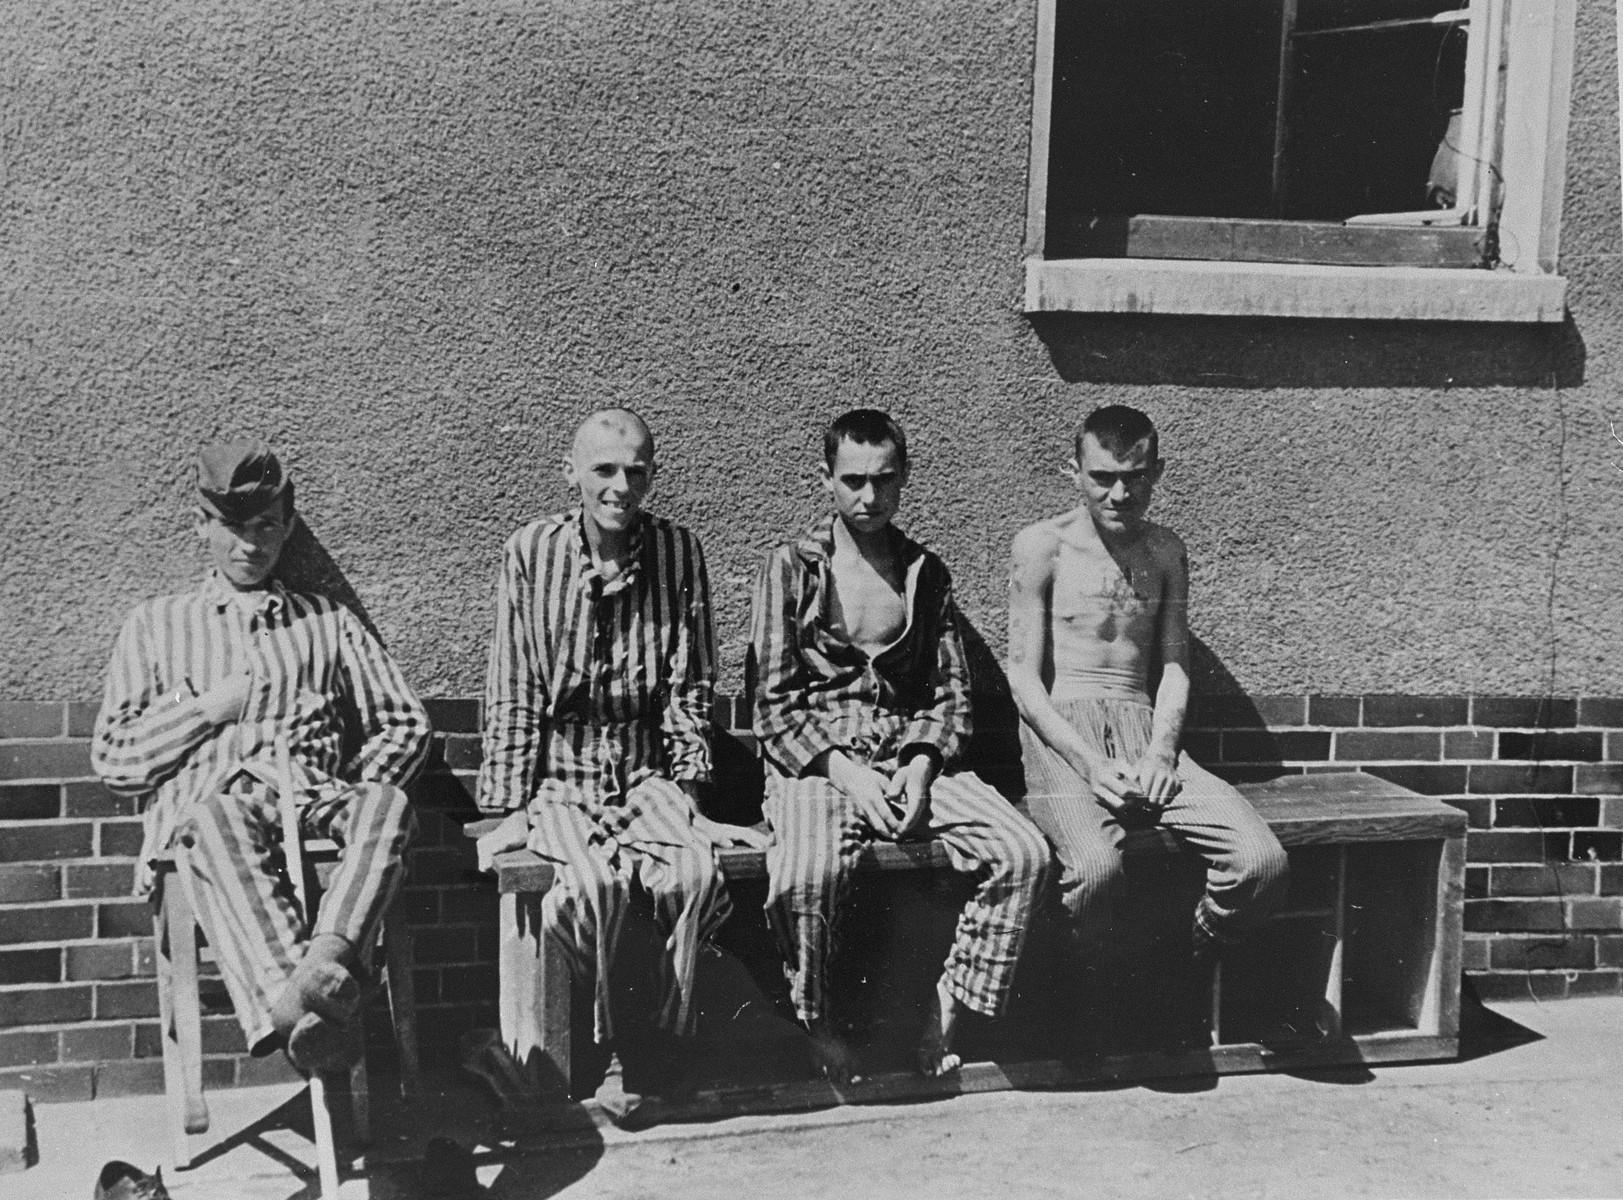 Survivors sit on a bench outside of a camp building in Bergen-Belsen.